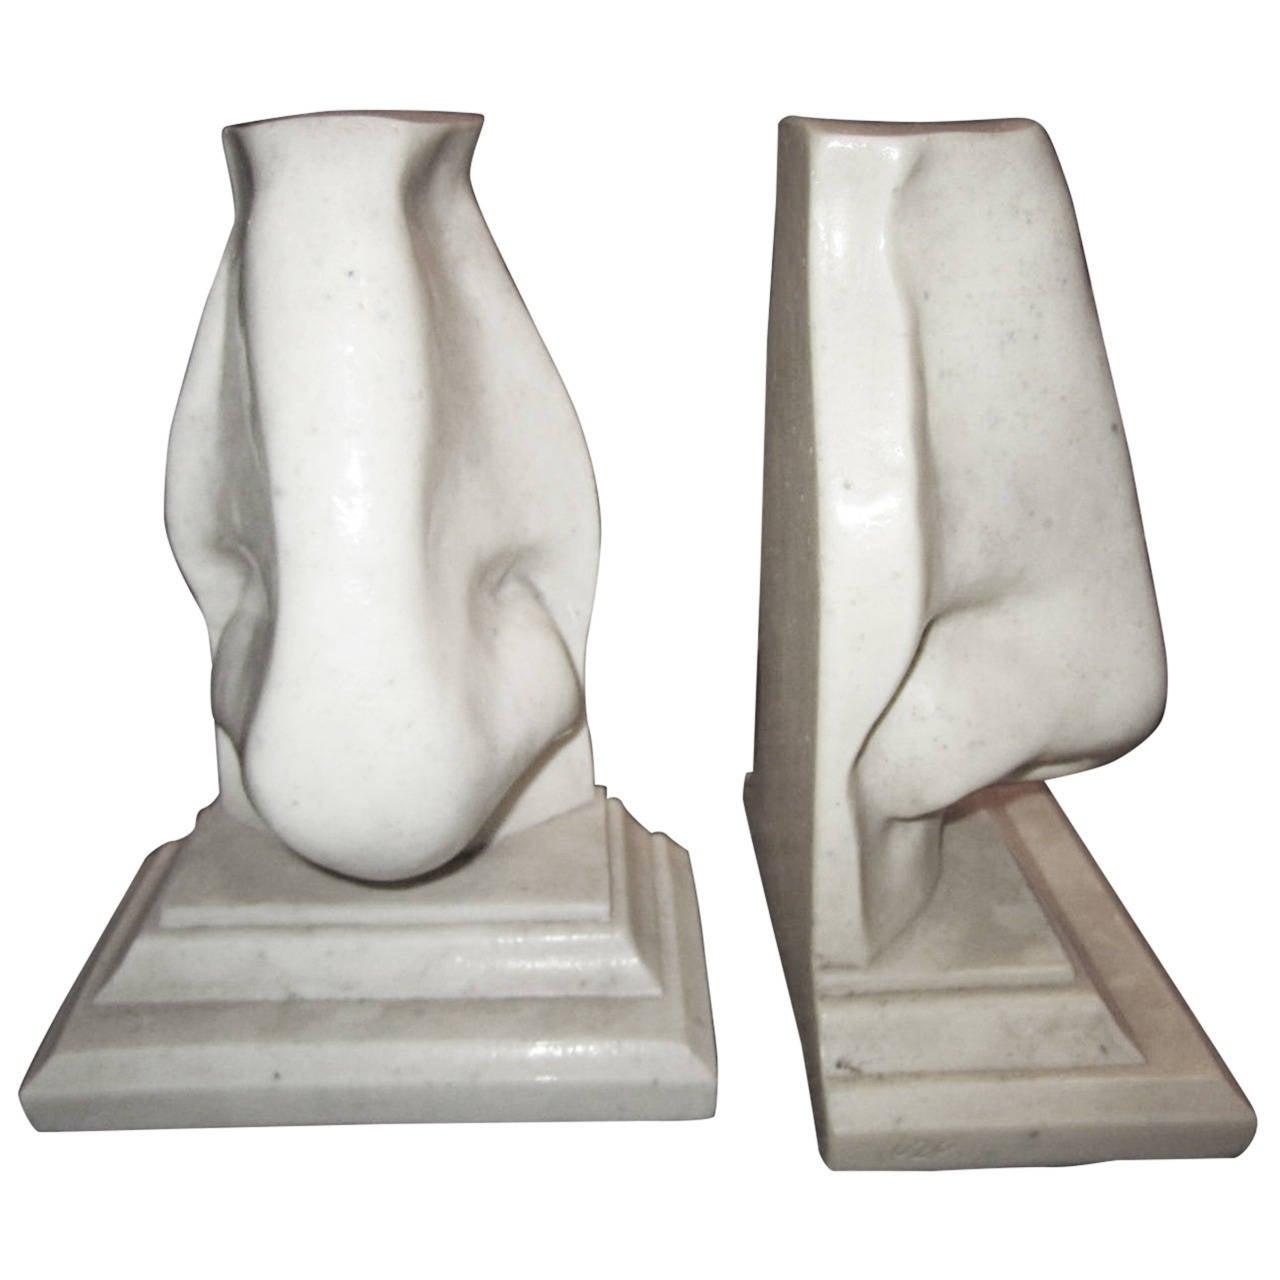 Unusual Pair of Italian Mid-Century Modern Oversized Nose Bookends